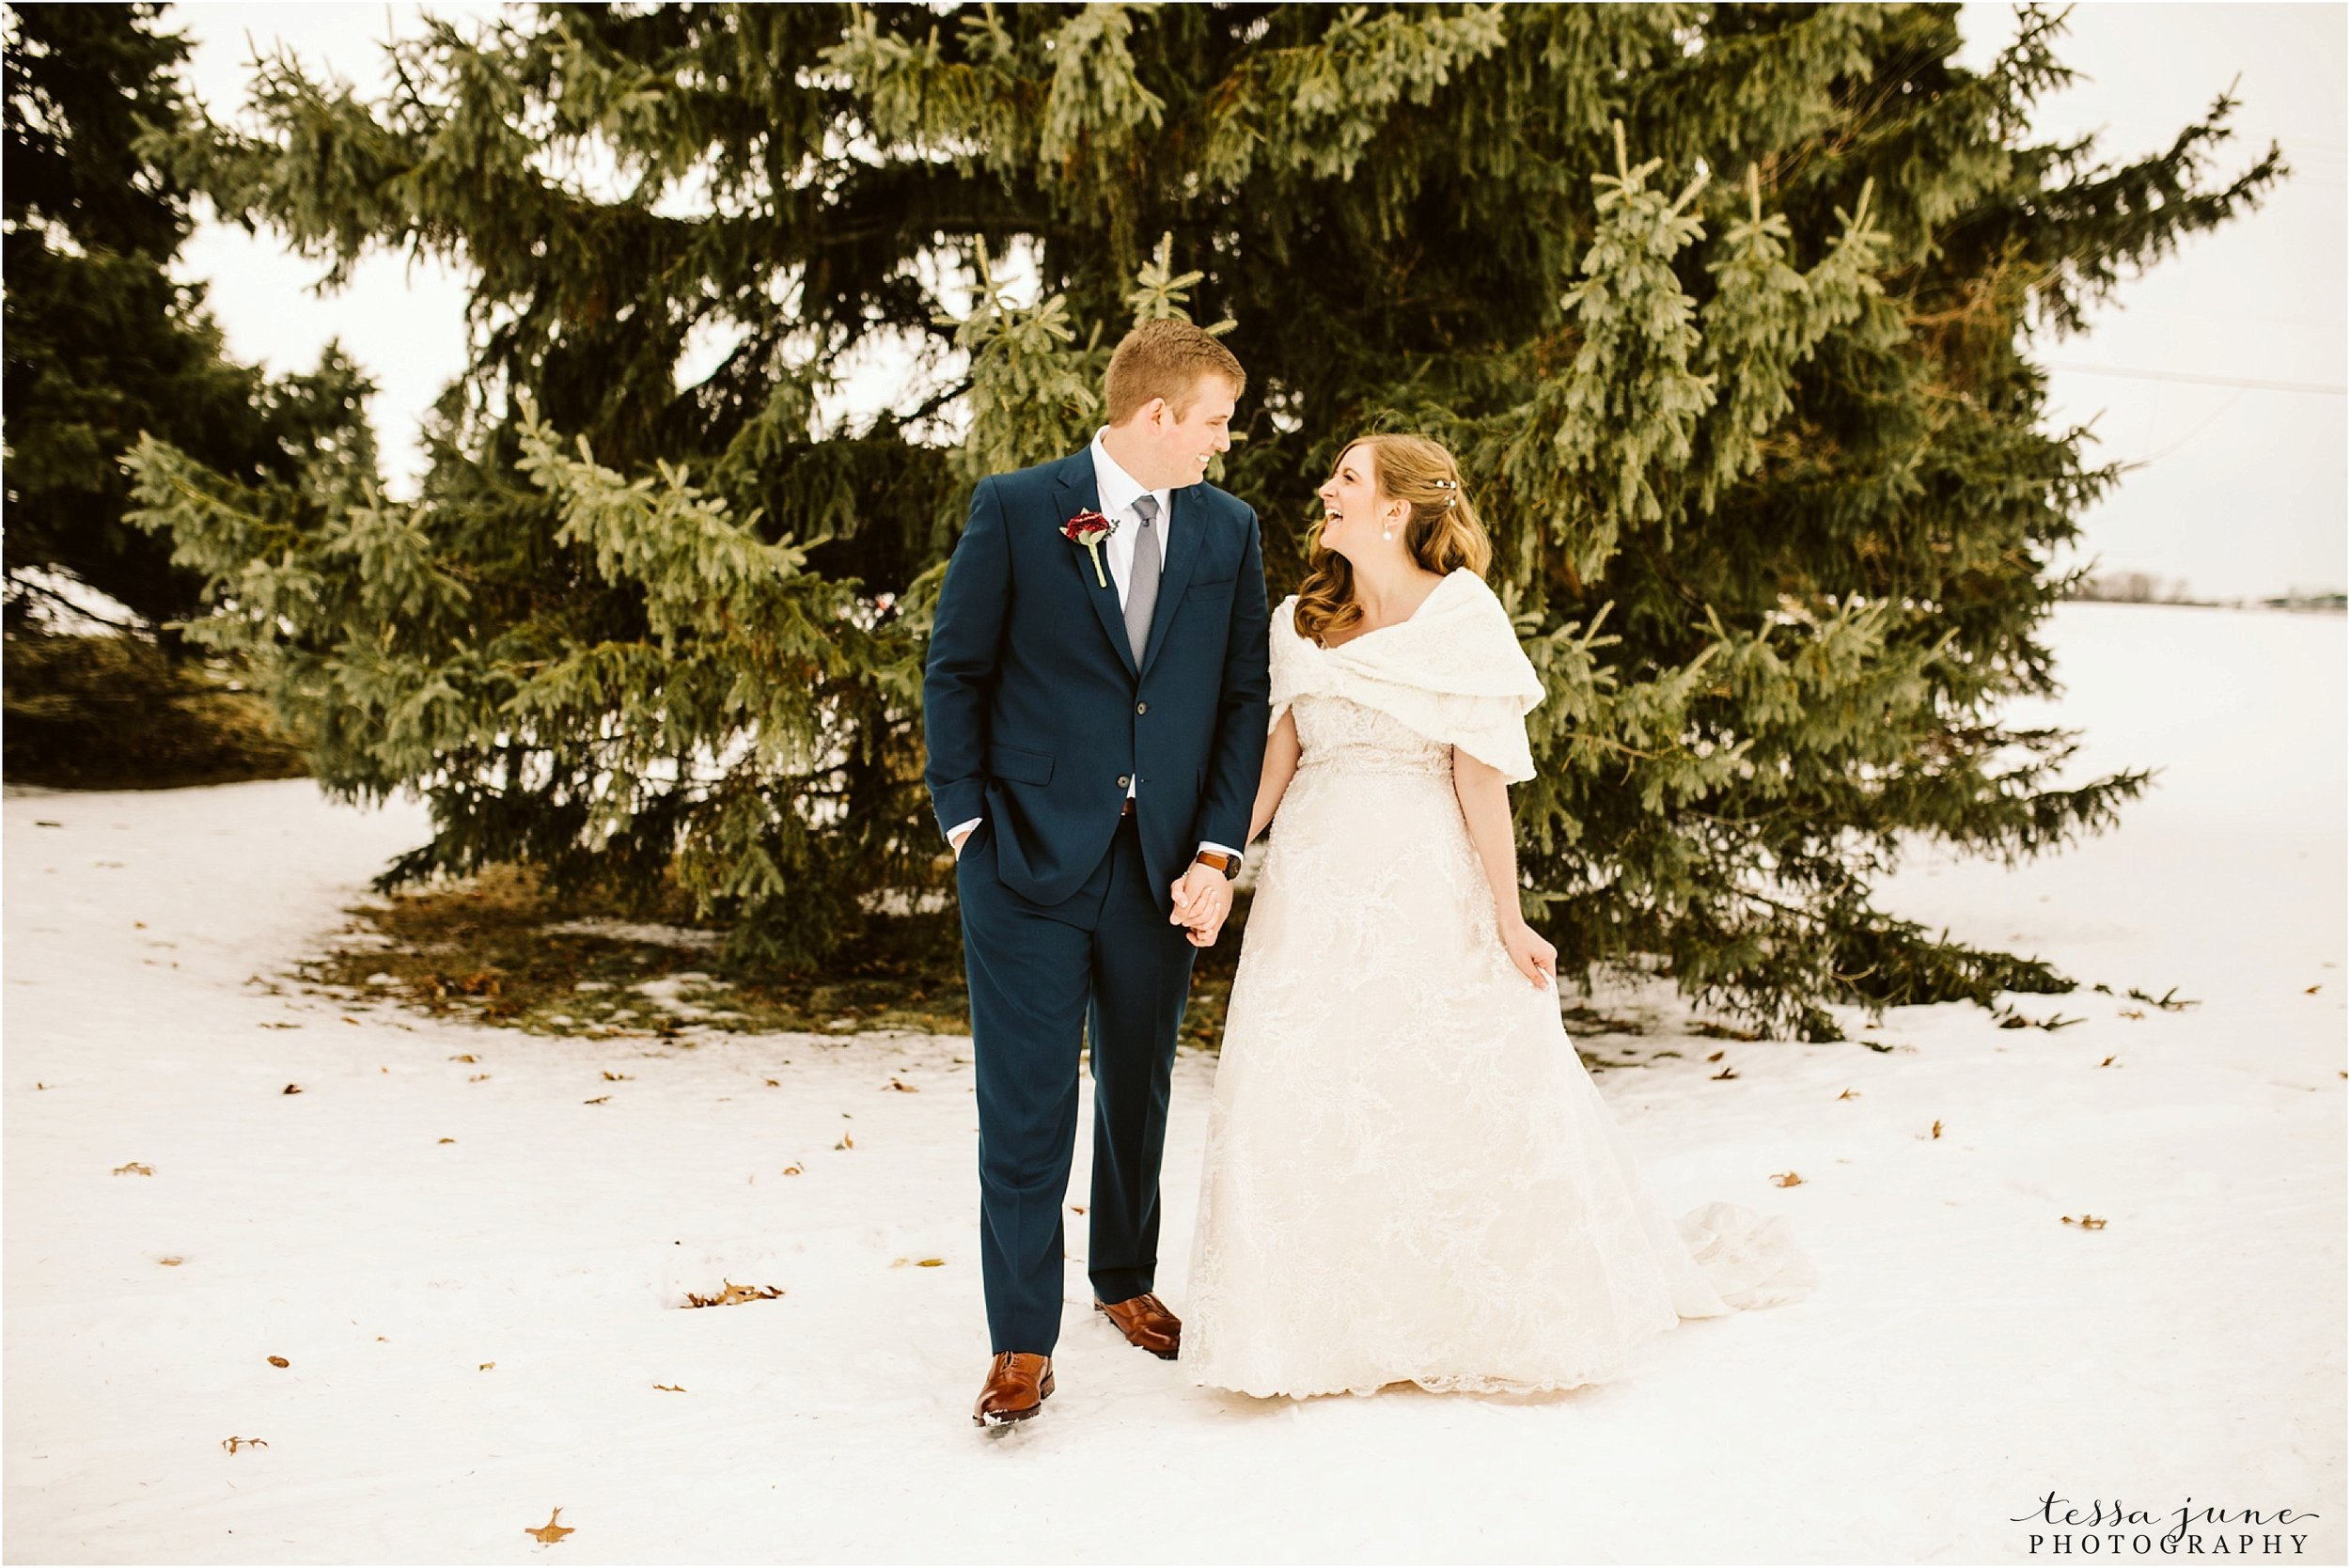 winter-wedding-in-eden-prairie-barn-minnesota-airplane-94.jpg